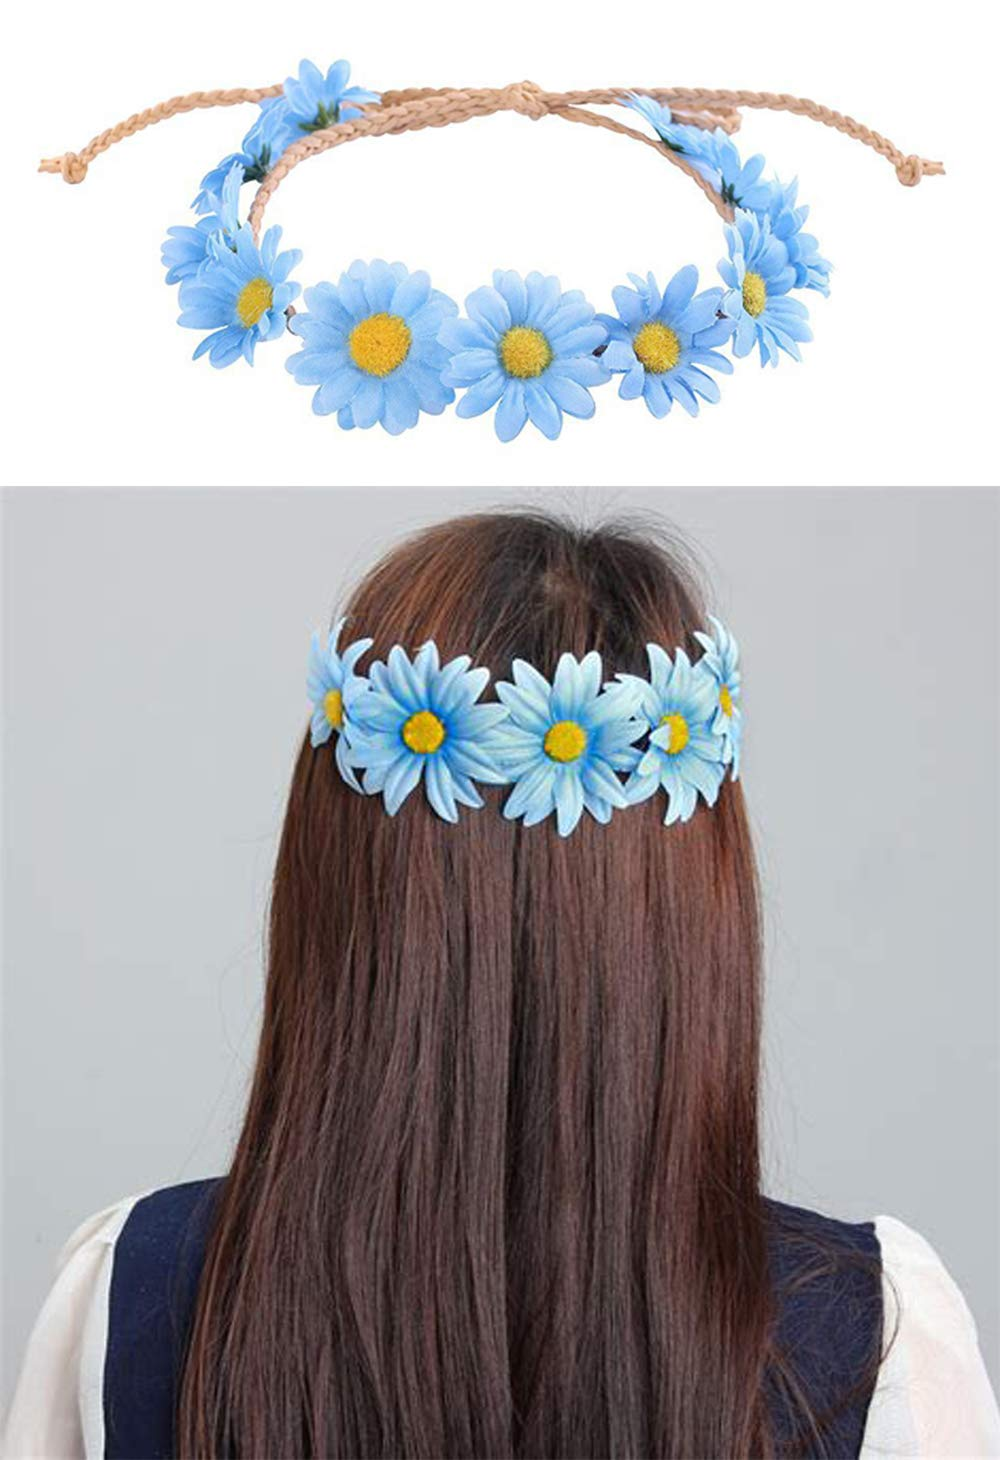 Little Daisy Flower Headband, Flower Halo,Hippie Flower Crown,Boho Floral Wreath,Bridal Headpiece,Sunflower Wreath for Women and Girls,Performances, Parties,Weddings,Festivals (Blue)